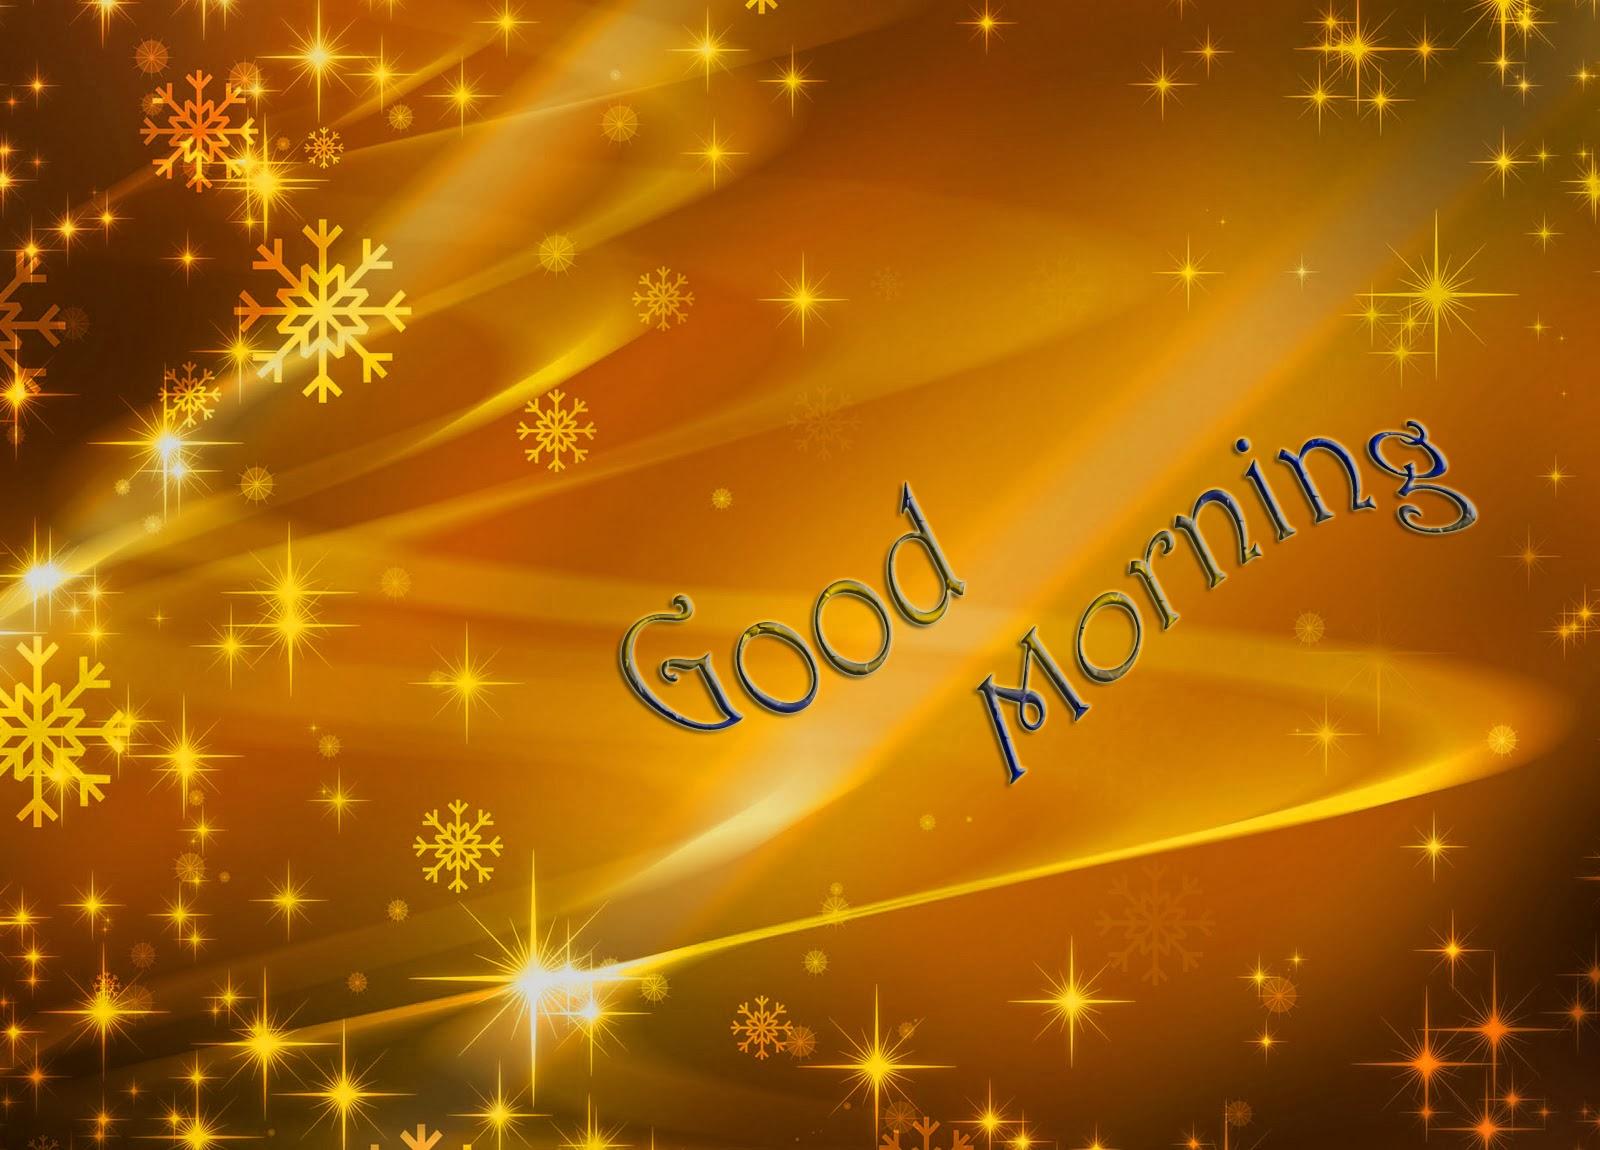 Good Morning Beautiful Wallpapers Good Morning Beautiful...